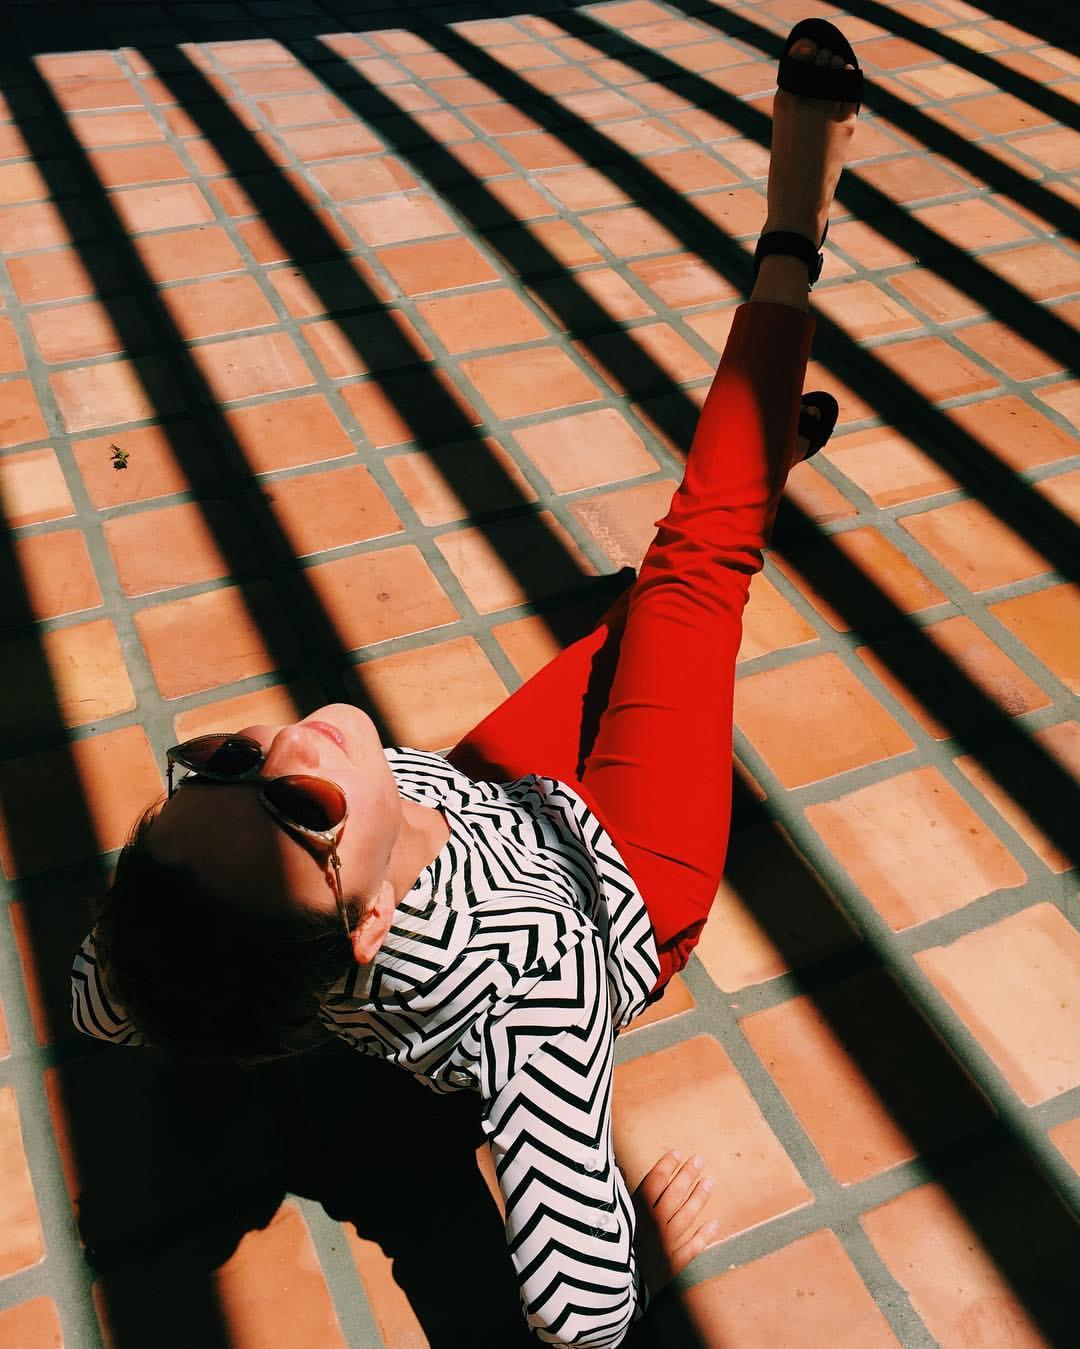 when-stacykeck-makes-you-look-fabulous-and-leggy-128366-fabulousbearisfabulous----laquintaresort-lines-shadow-werk-hard-play-hard-shadowwork-black-white-and-red-legsfordays-terracotta-palmsprings-laquinta-desert-desertvibes-model-s_27415714082_o.jpg